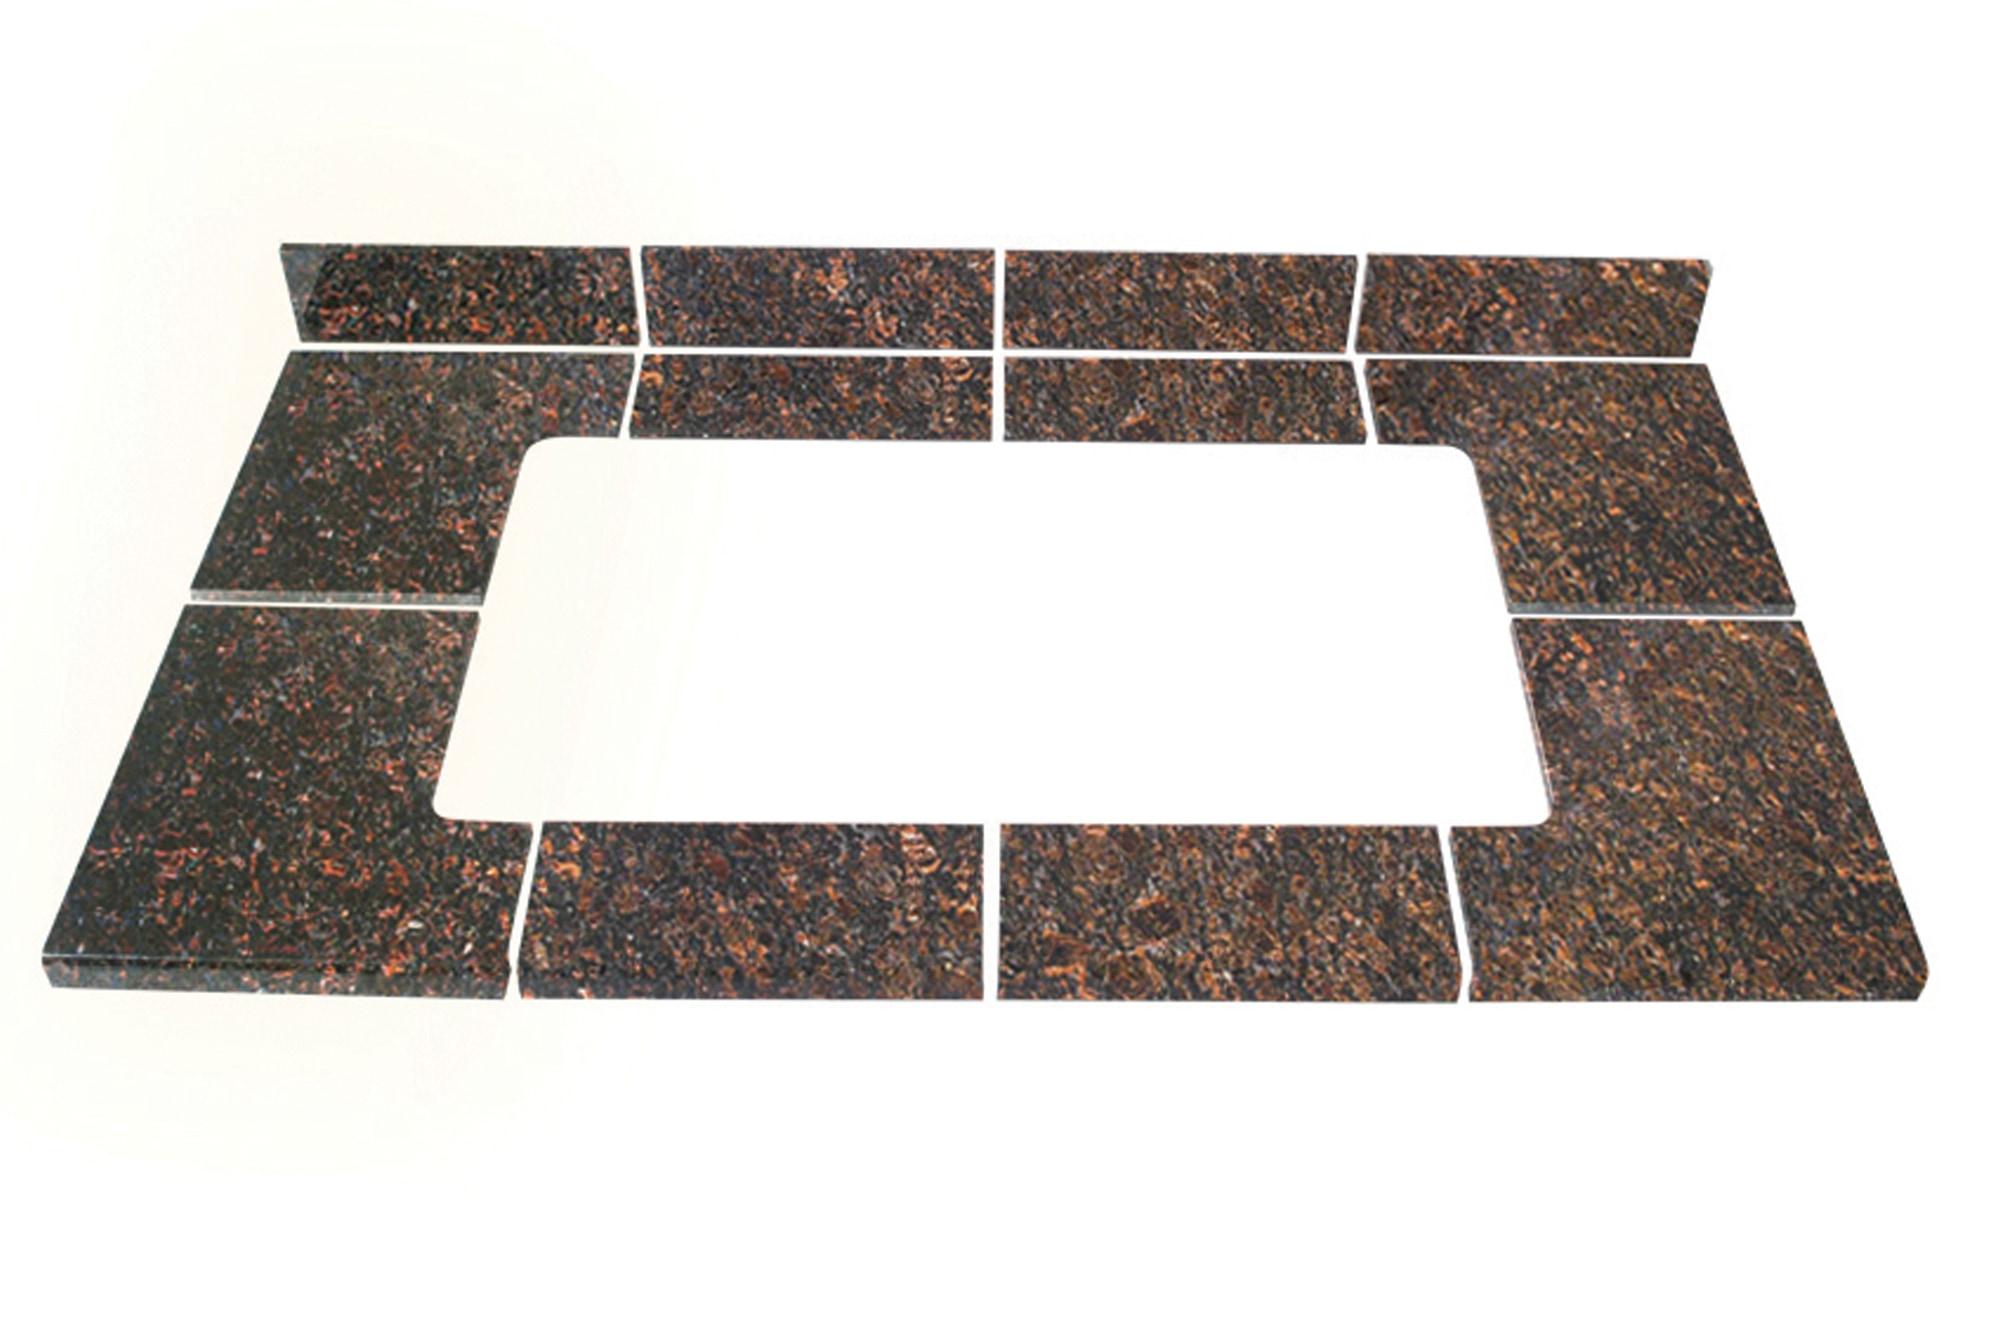 Modular Kitchen Tiles : Pedra Granite Modular Kitchen Tiles - Topstone Collection Tan Brown ...